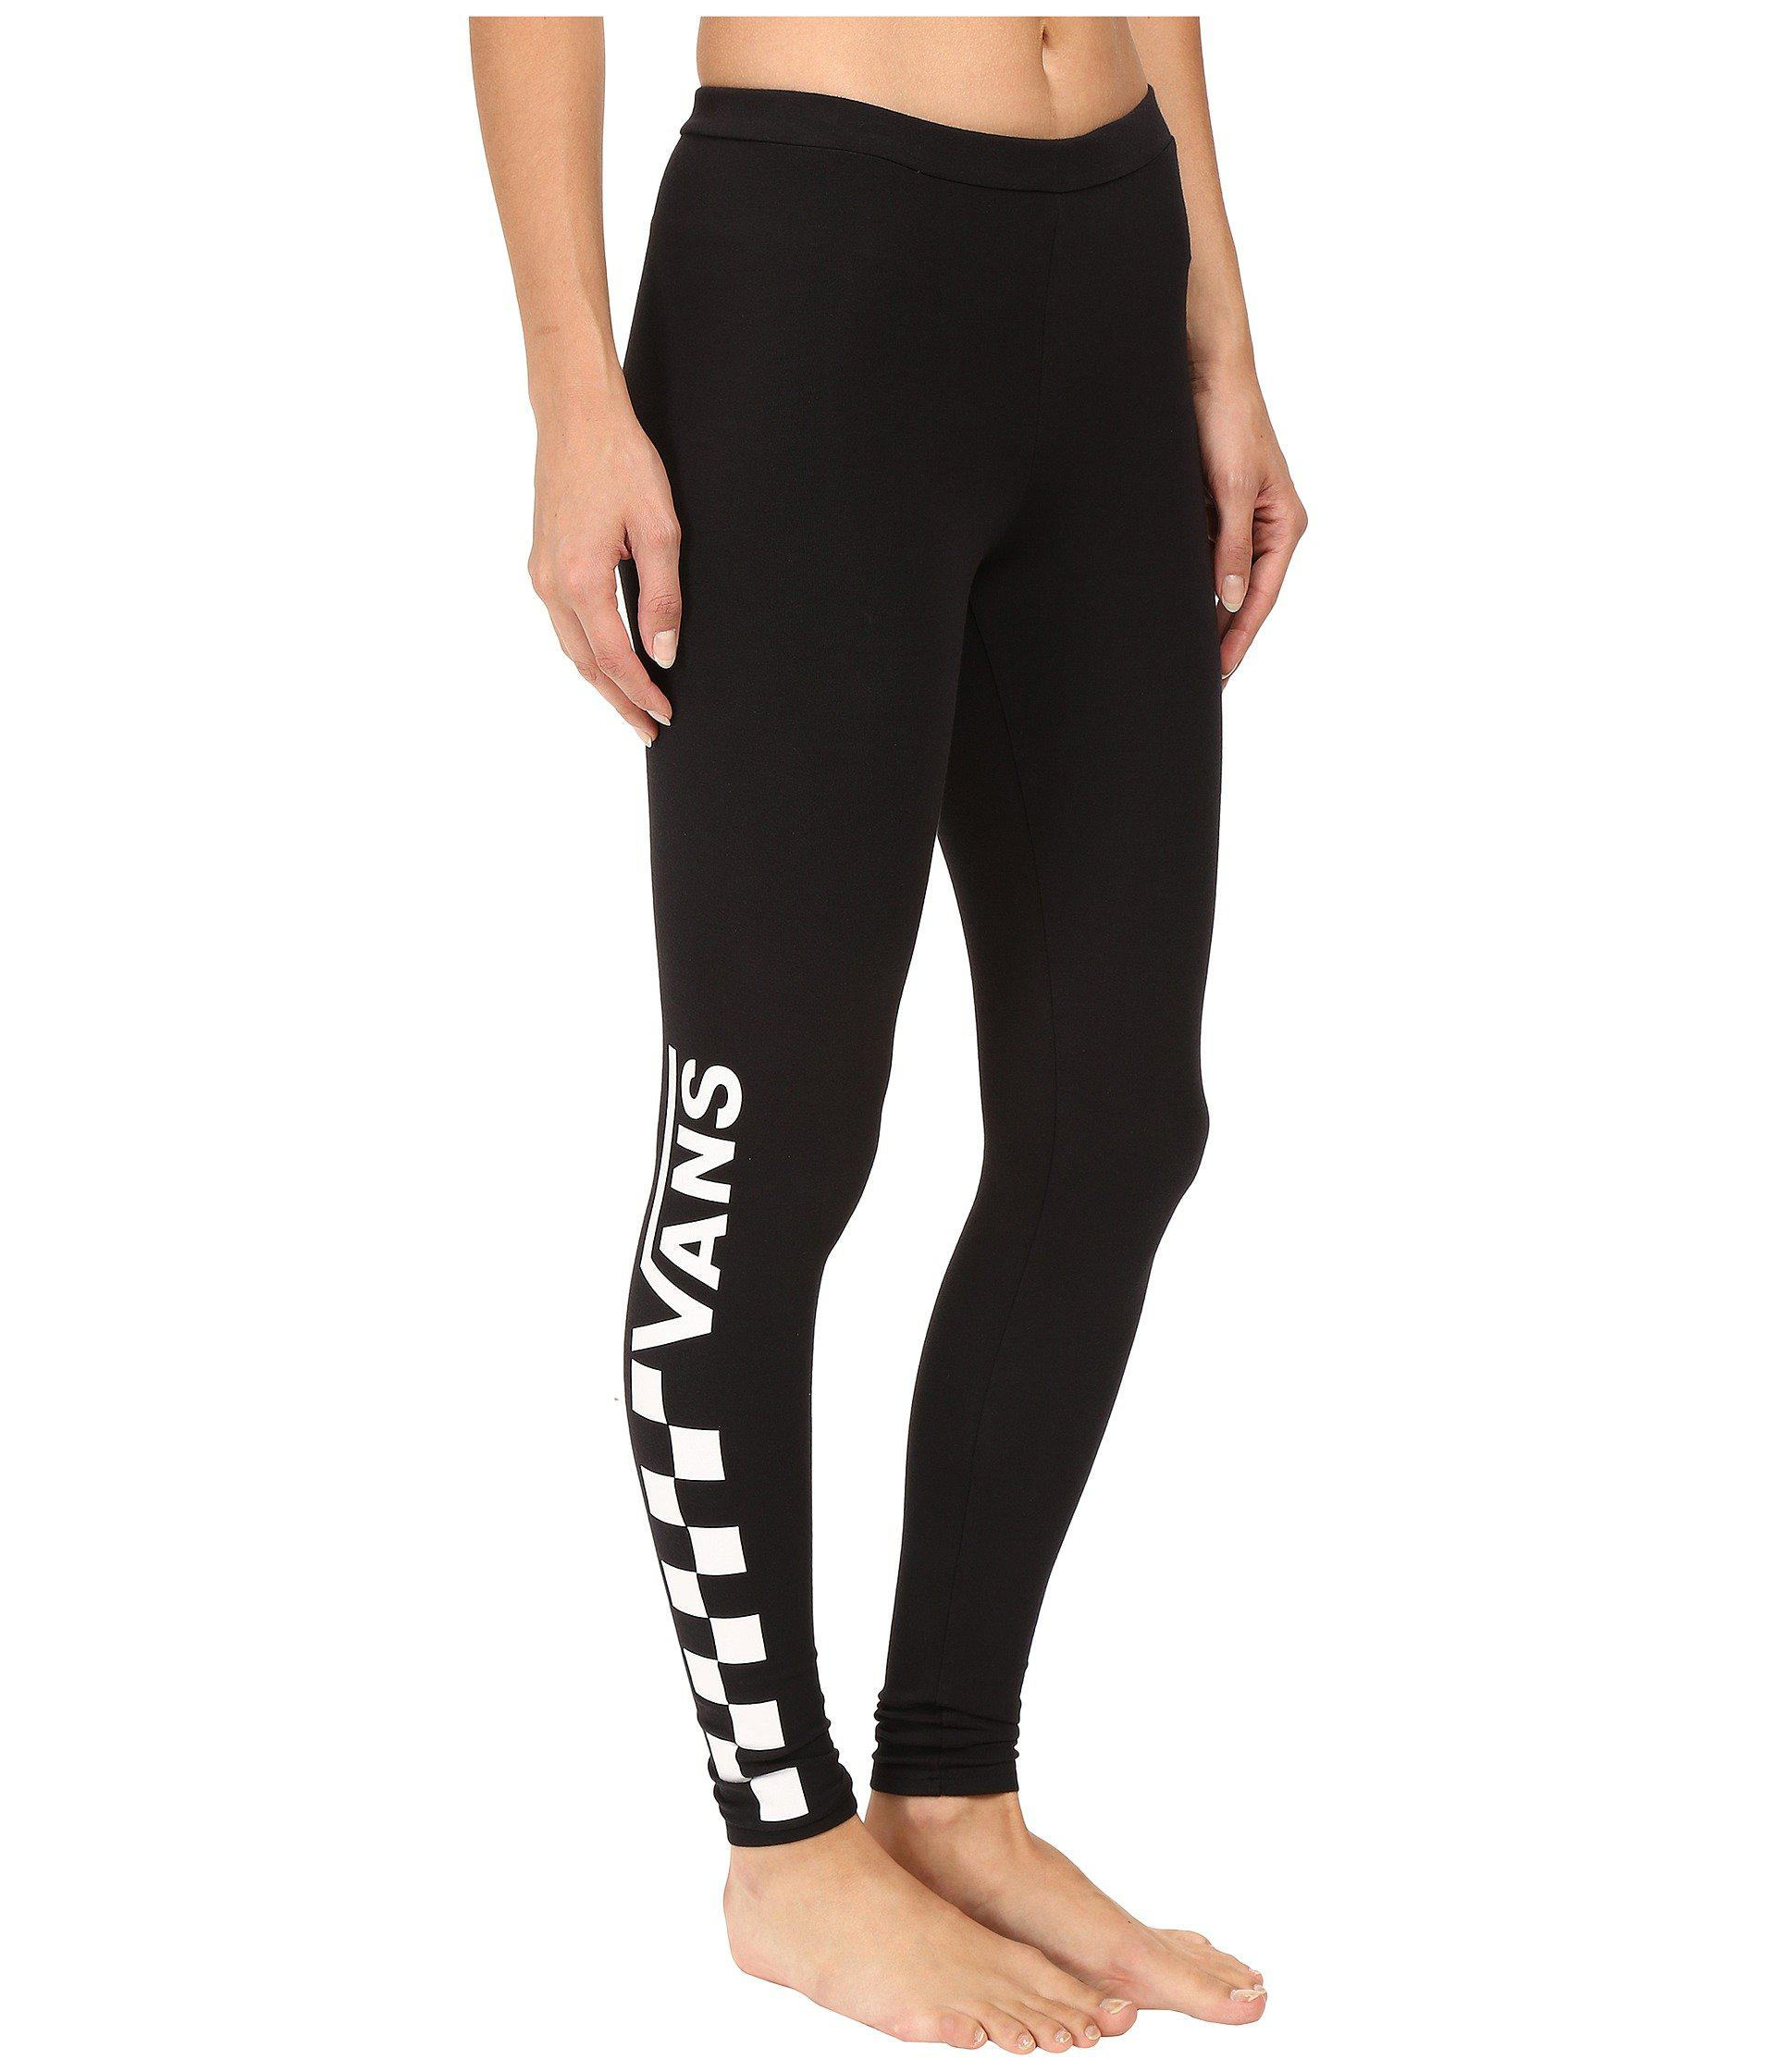 3967fdba04 Lyst - Vans Chalkboard Leggings in Black